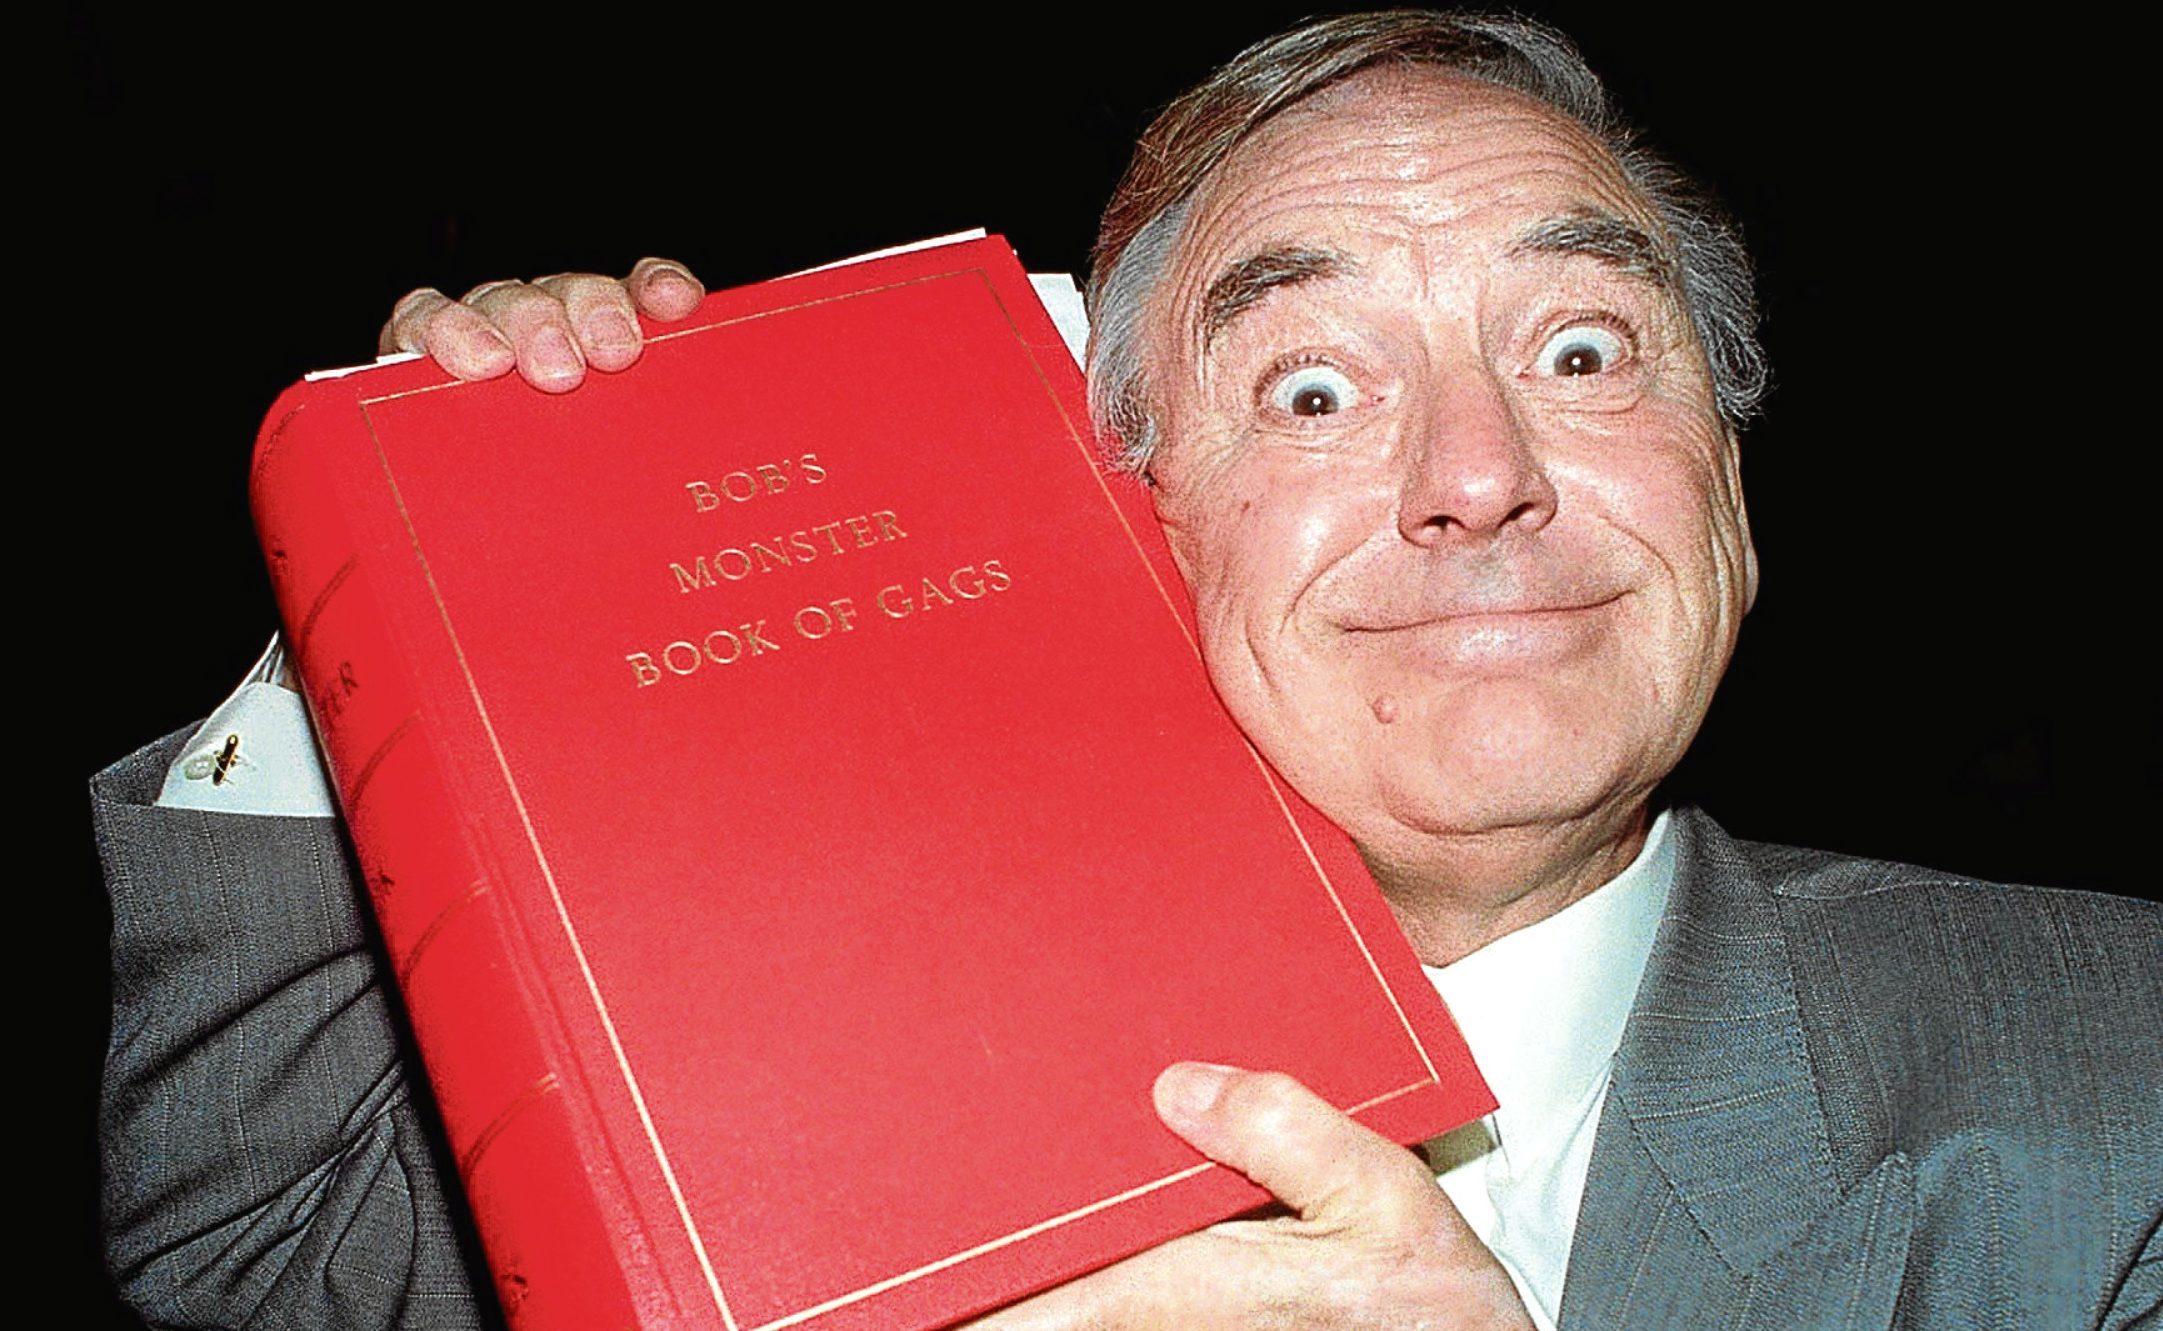 Bob with one of his priceless joke books (David Cheskin/PA)